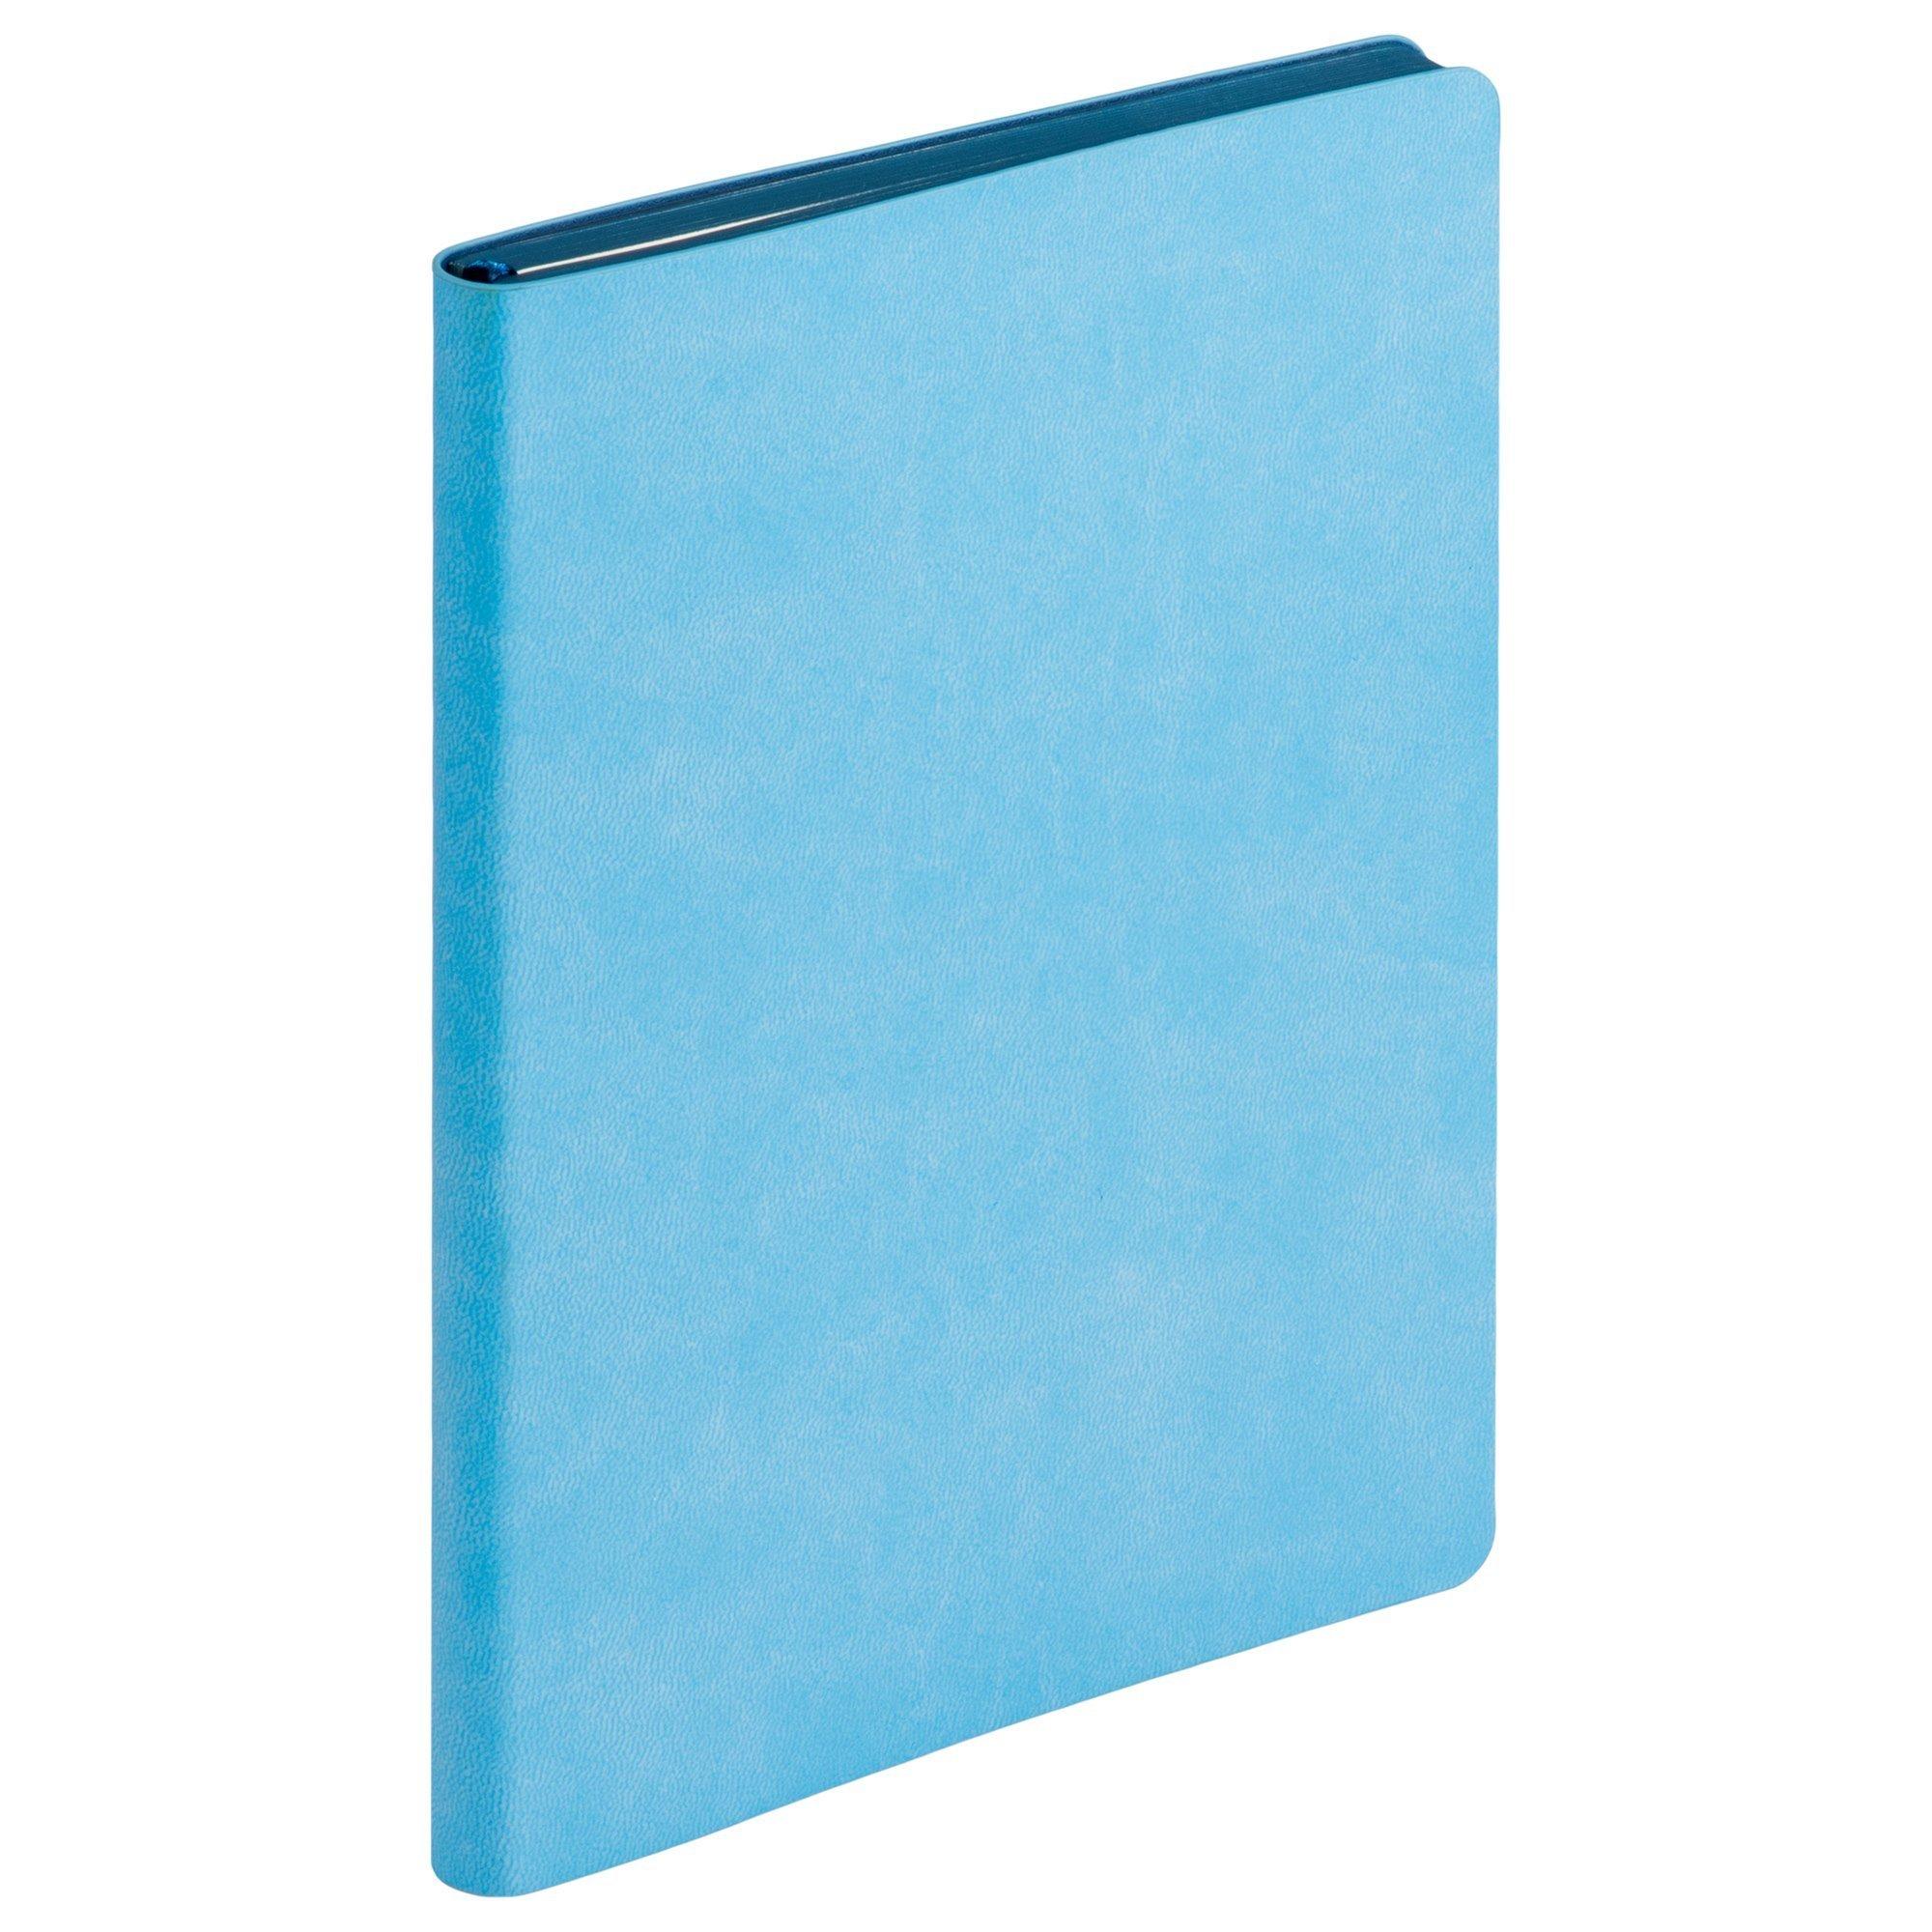 Ежедневник недатированный, Portobello Trend, Latte NEW, 145х210, 256 стр, голубой/синий